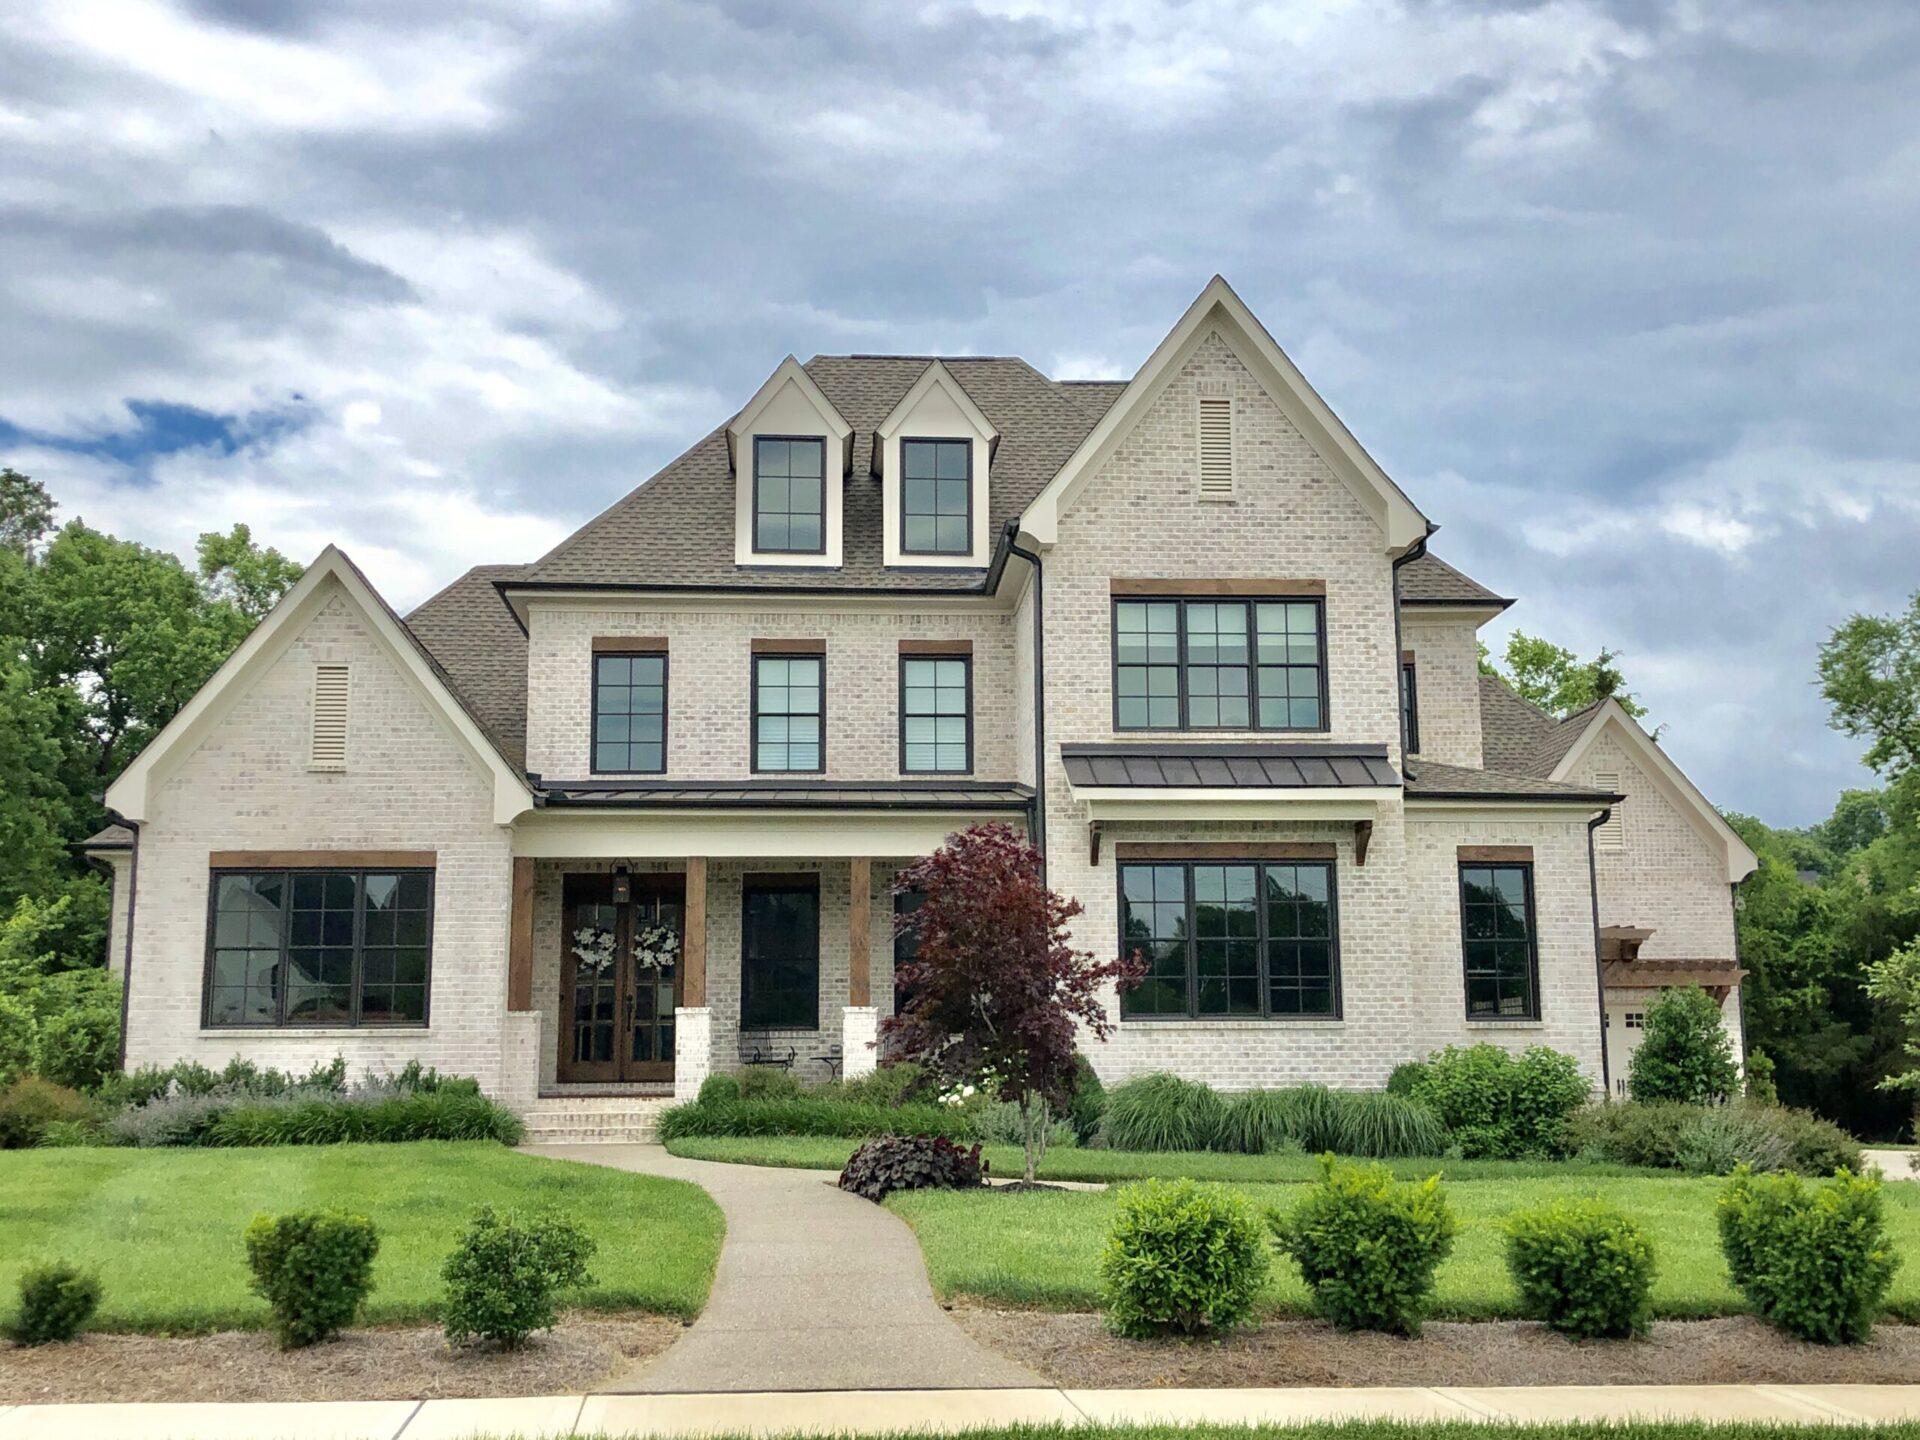 Allens Green release - Premier, High-end home builders for luxury homes - luxury home builder | Nashville, TN